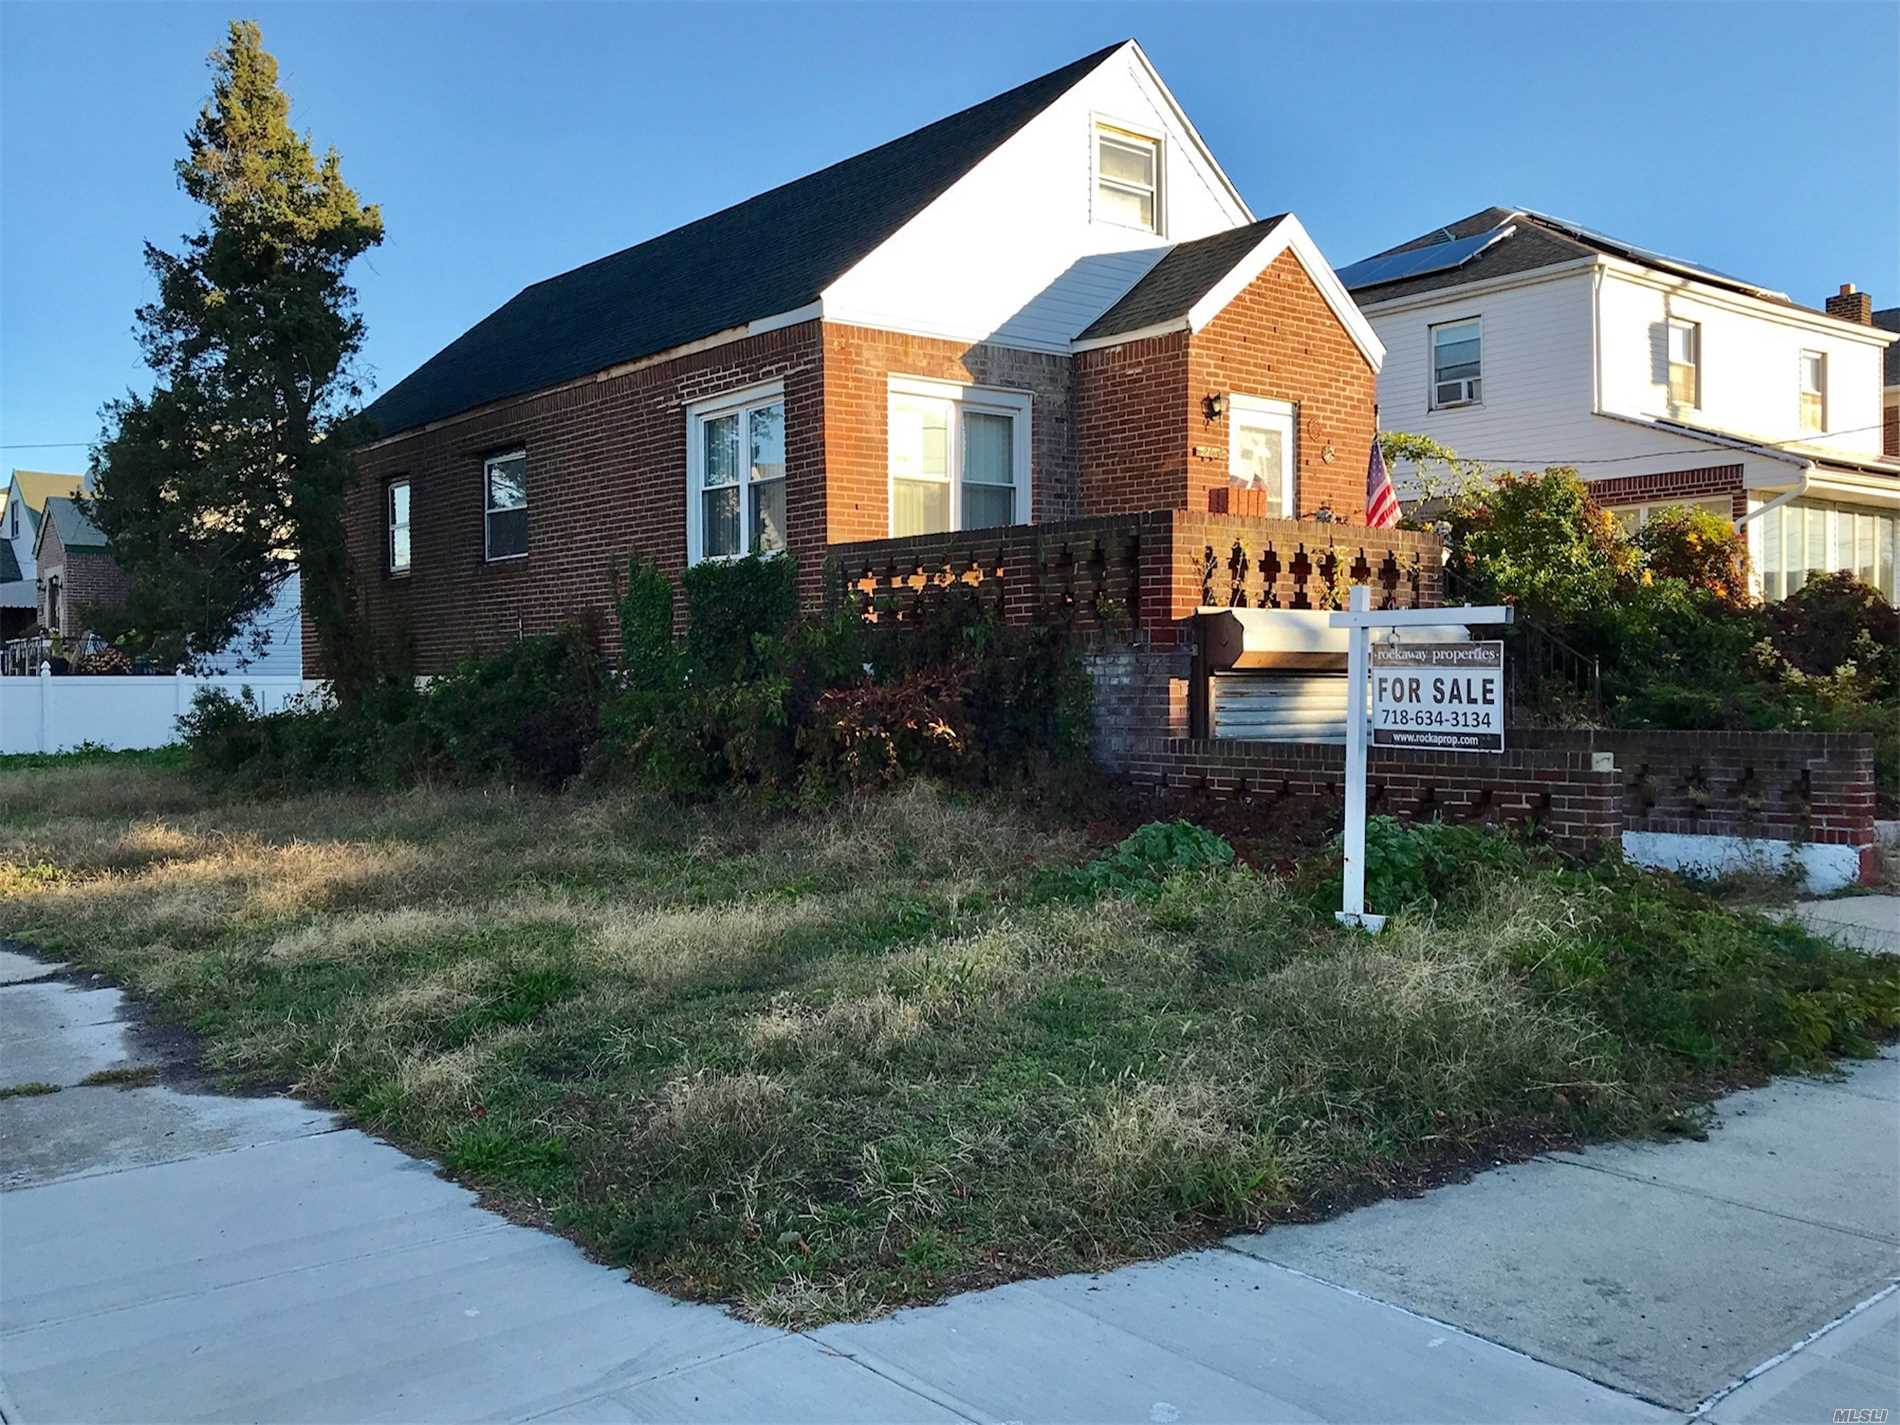 Property for sale at 126-18 Cronston Avenue, Rockaway Park NY 11694, Rockaway Park,  New York 11694